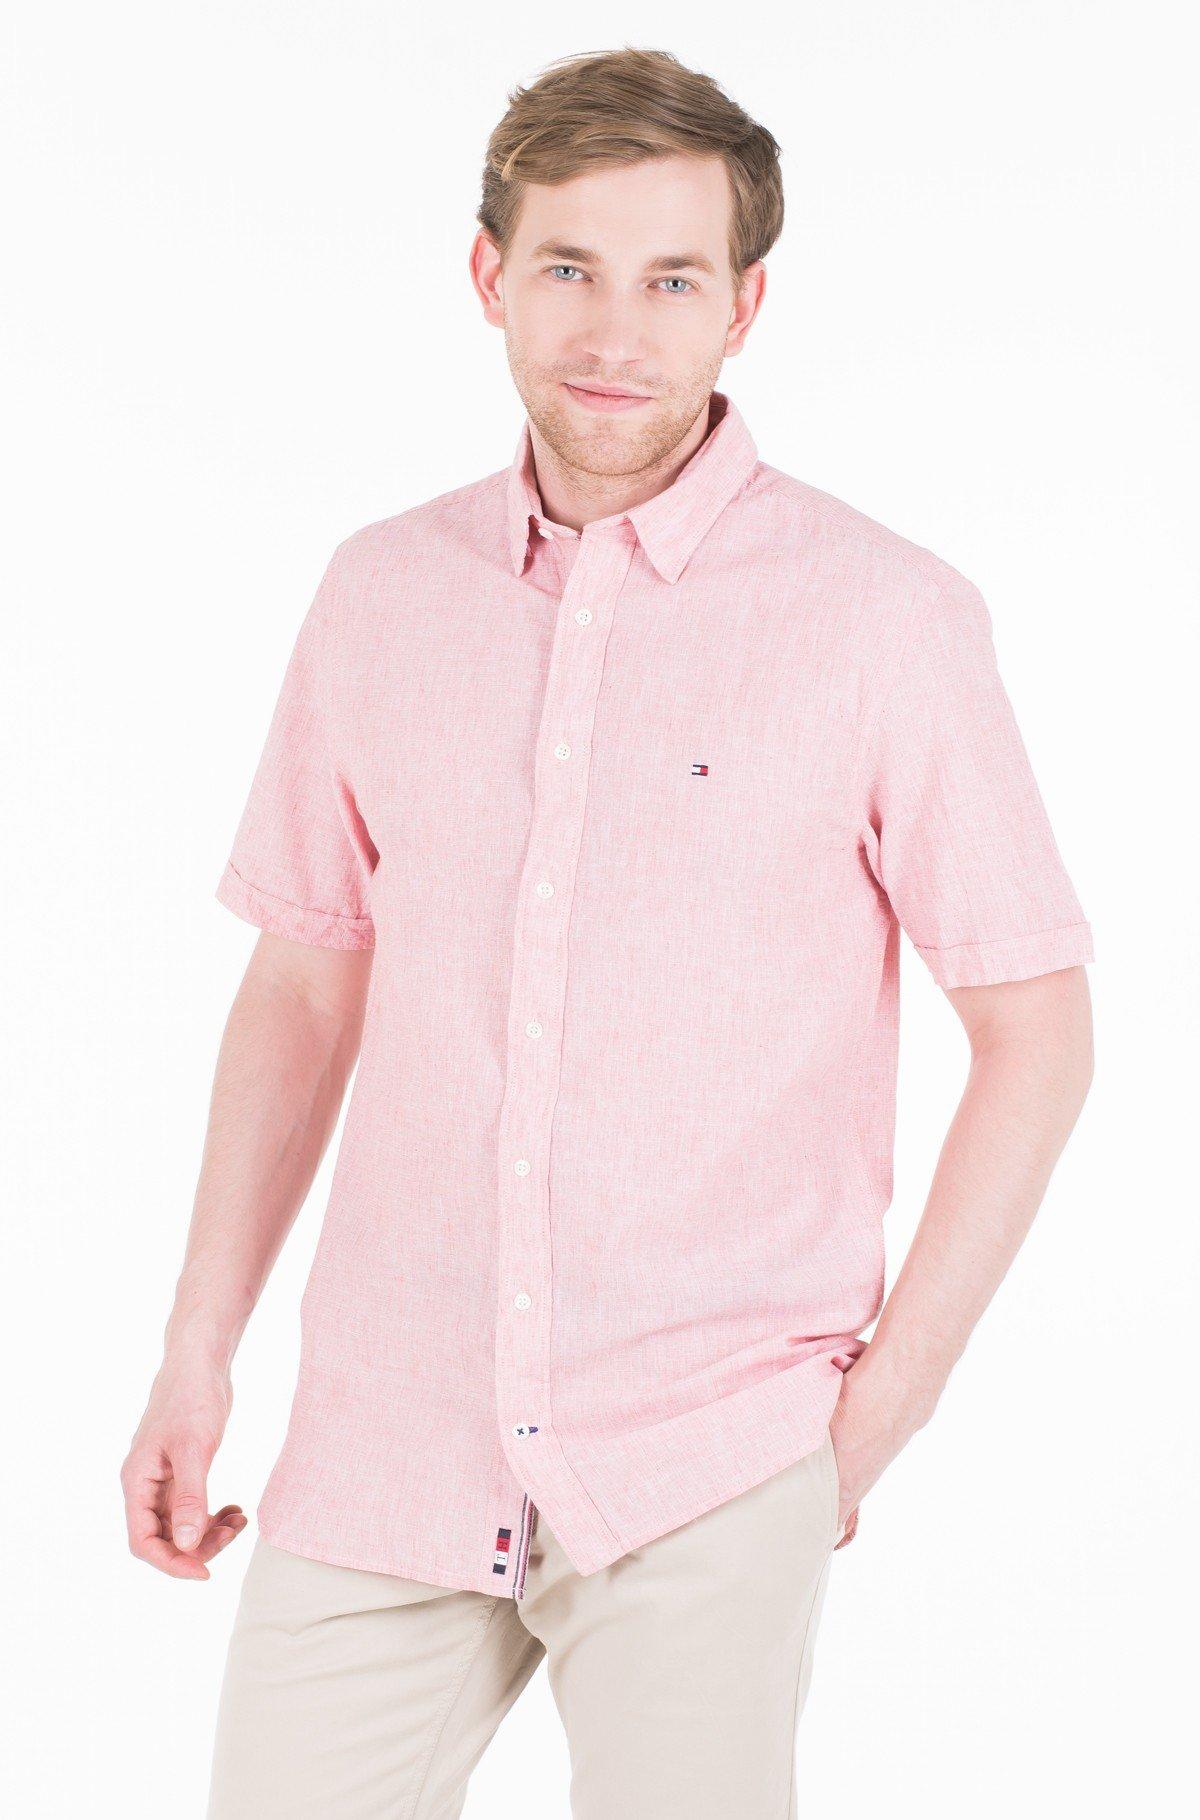 Marškiniai su trumpomis rankovėmis COTTON LINEN SHIRT S/S-full-1